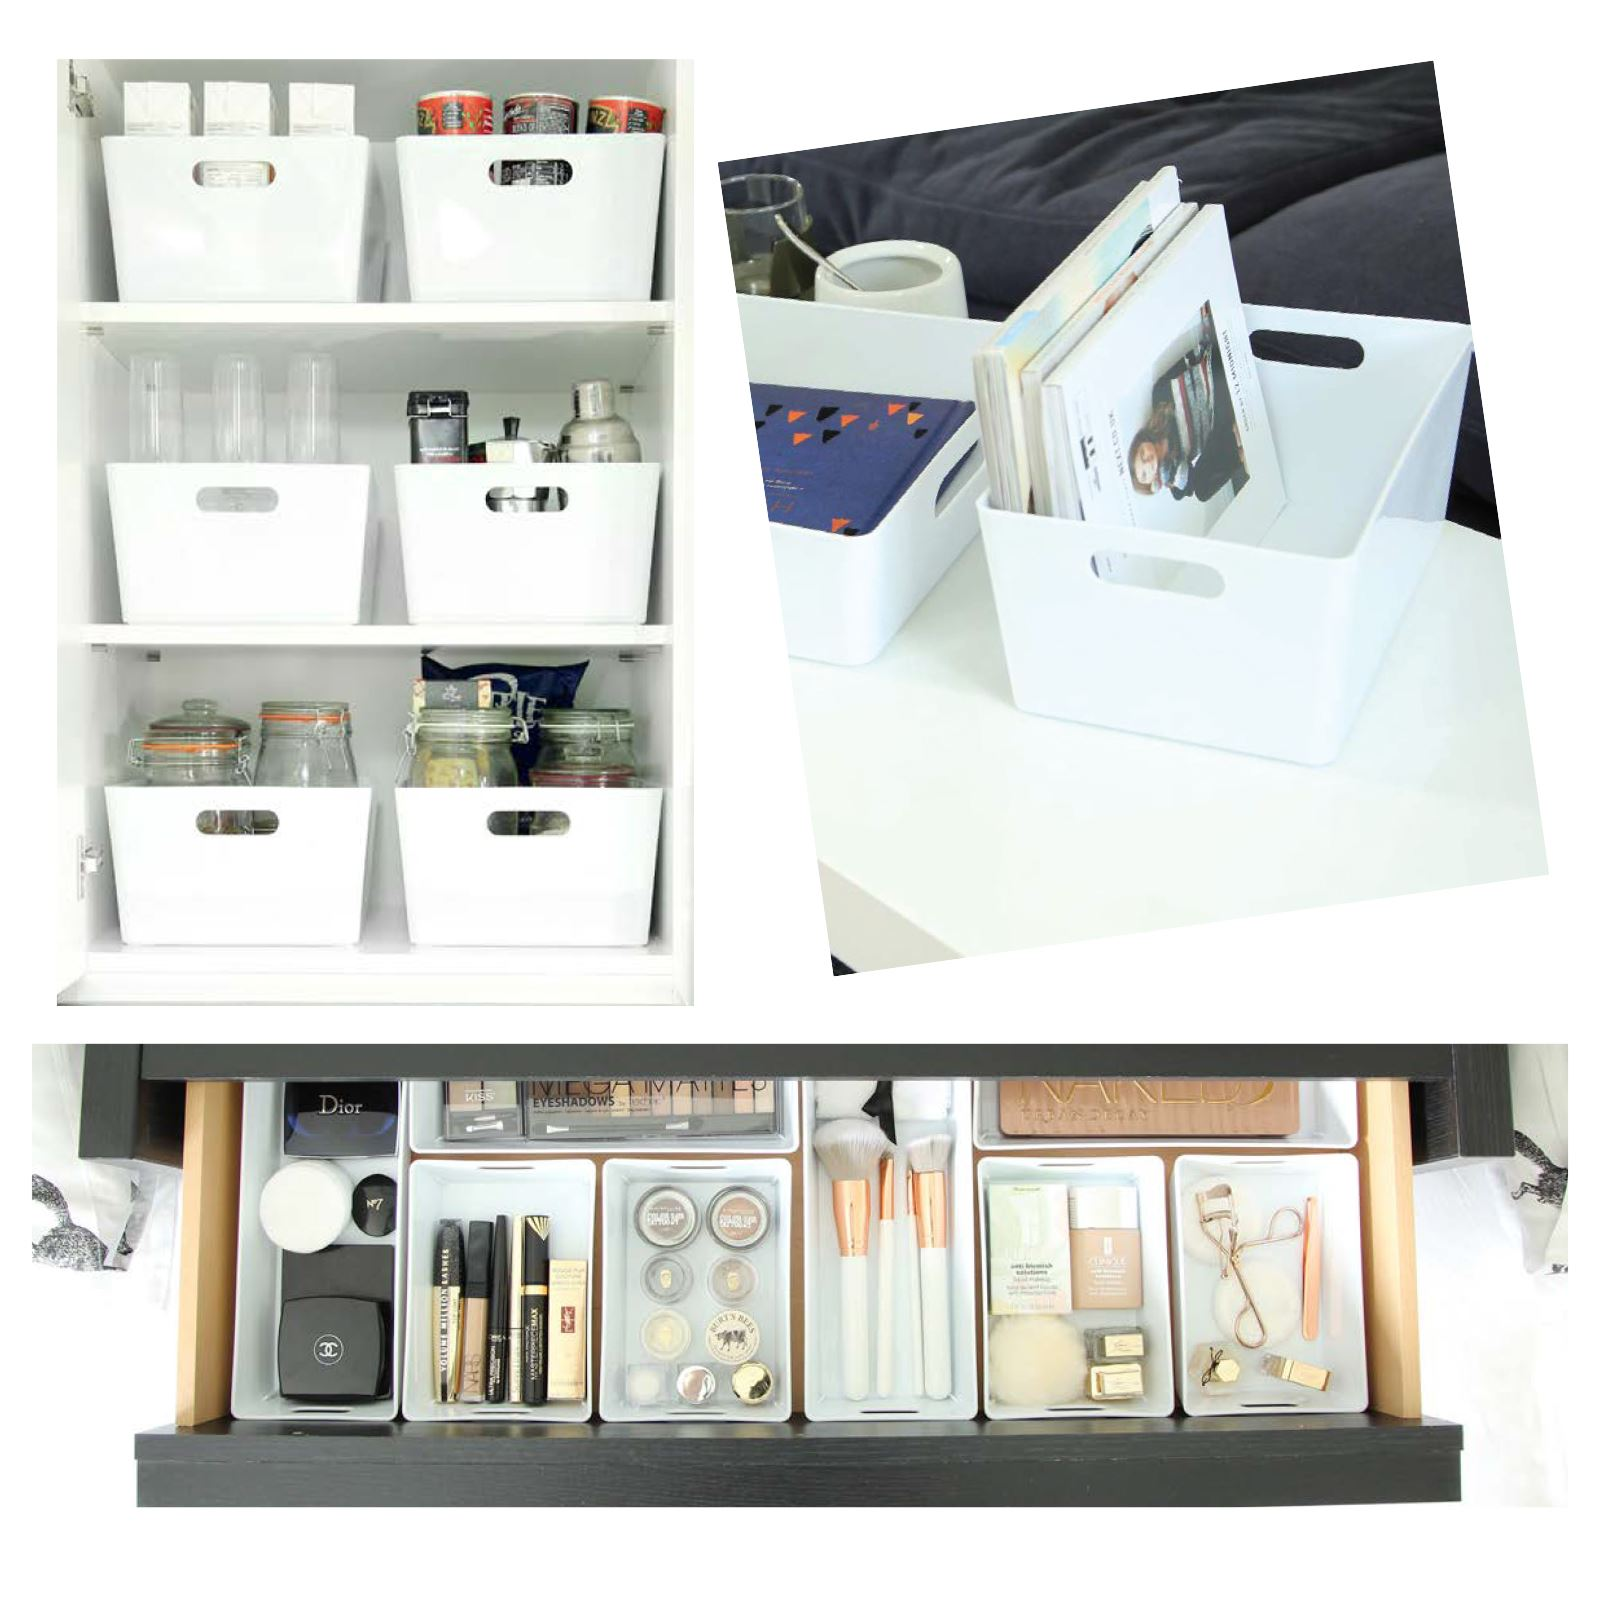 Plastic-Handy-Fruit-Vegetable-Home-Kitchen-Storage-Basket-Crate-Tidy-Organiser thumbnail 11